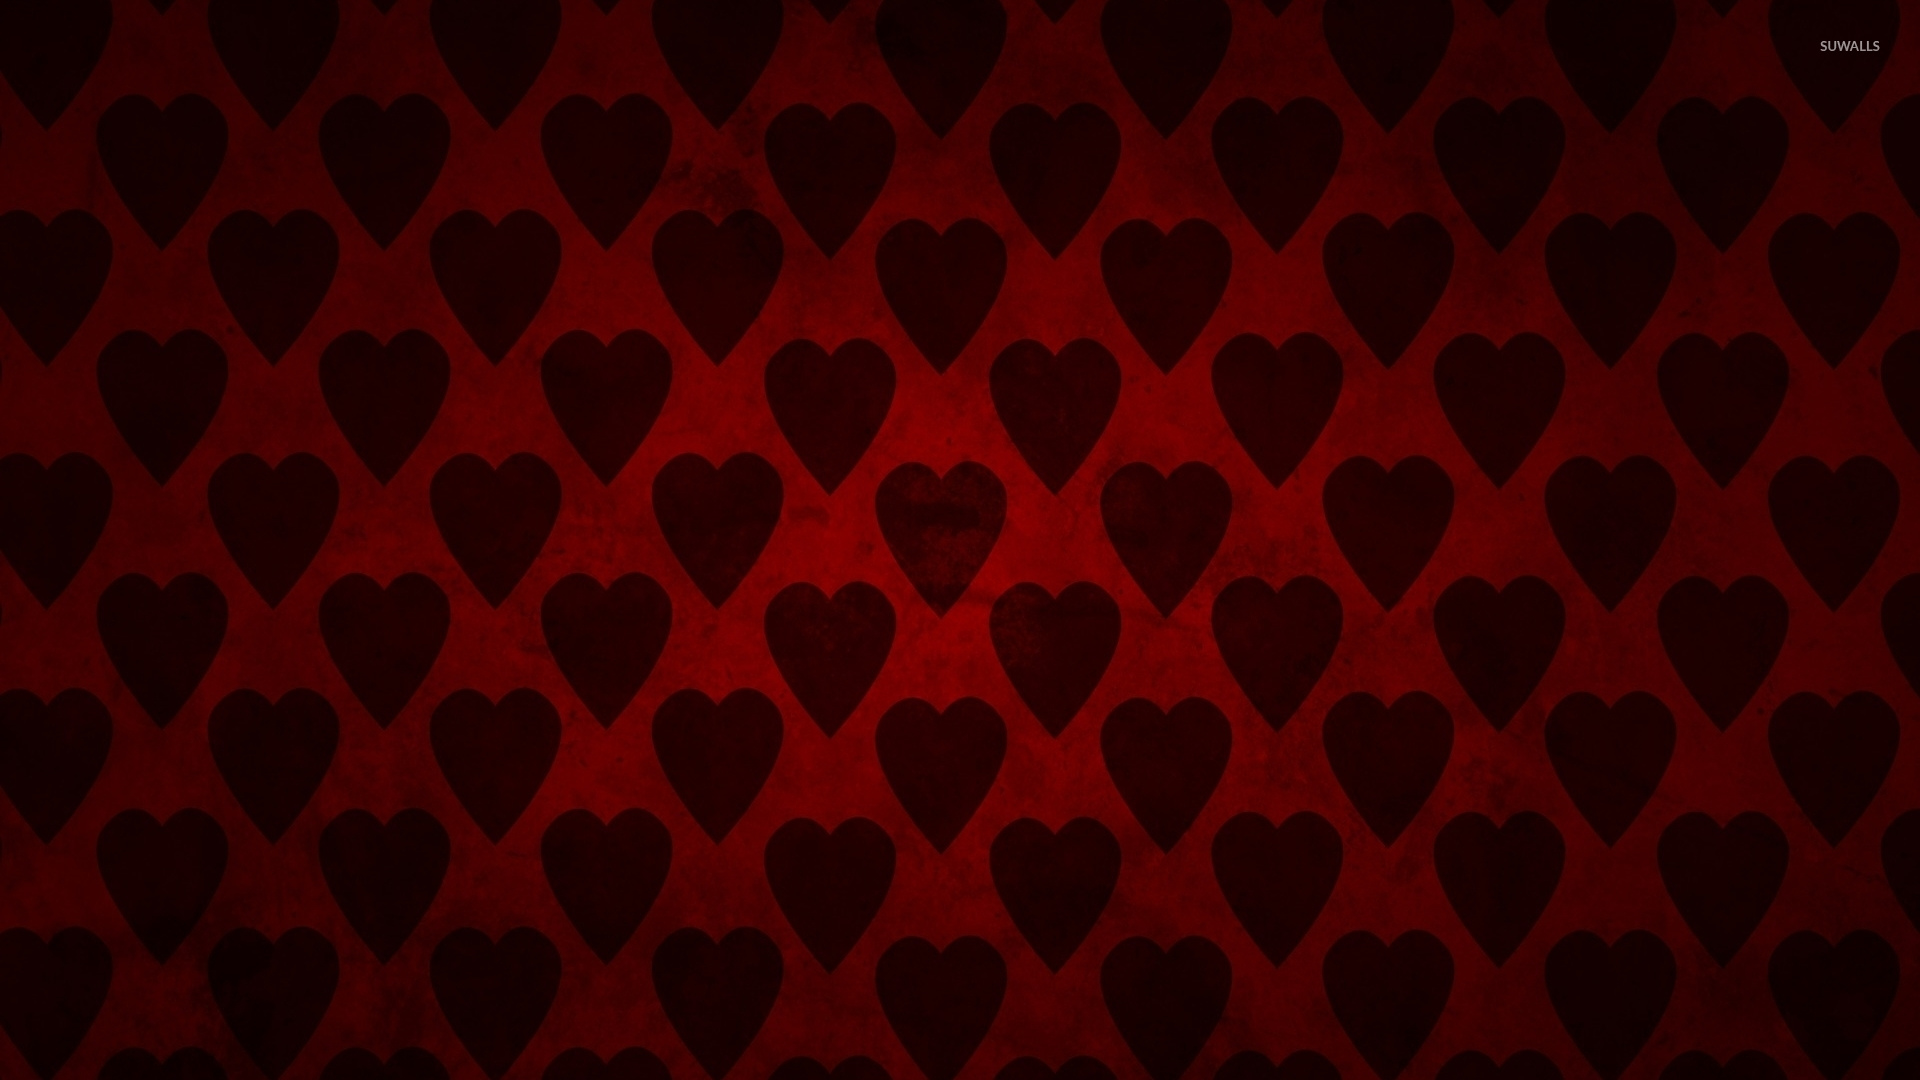 Fall Mountain Lake Wallpaper Red Hearts Wallpaper Digital Art Wallpapers 33984